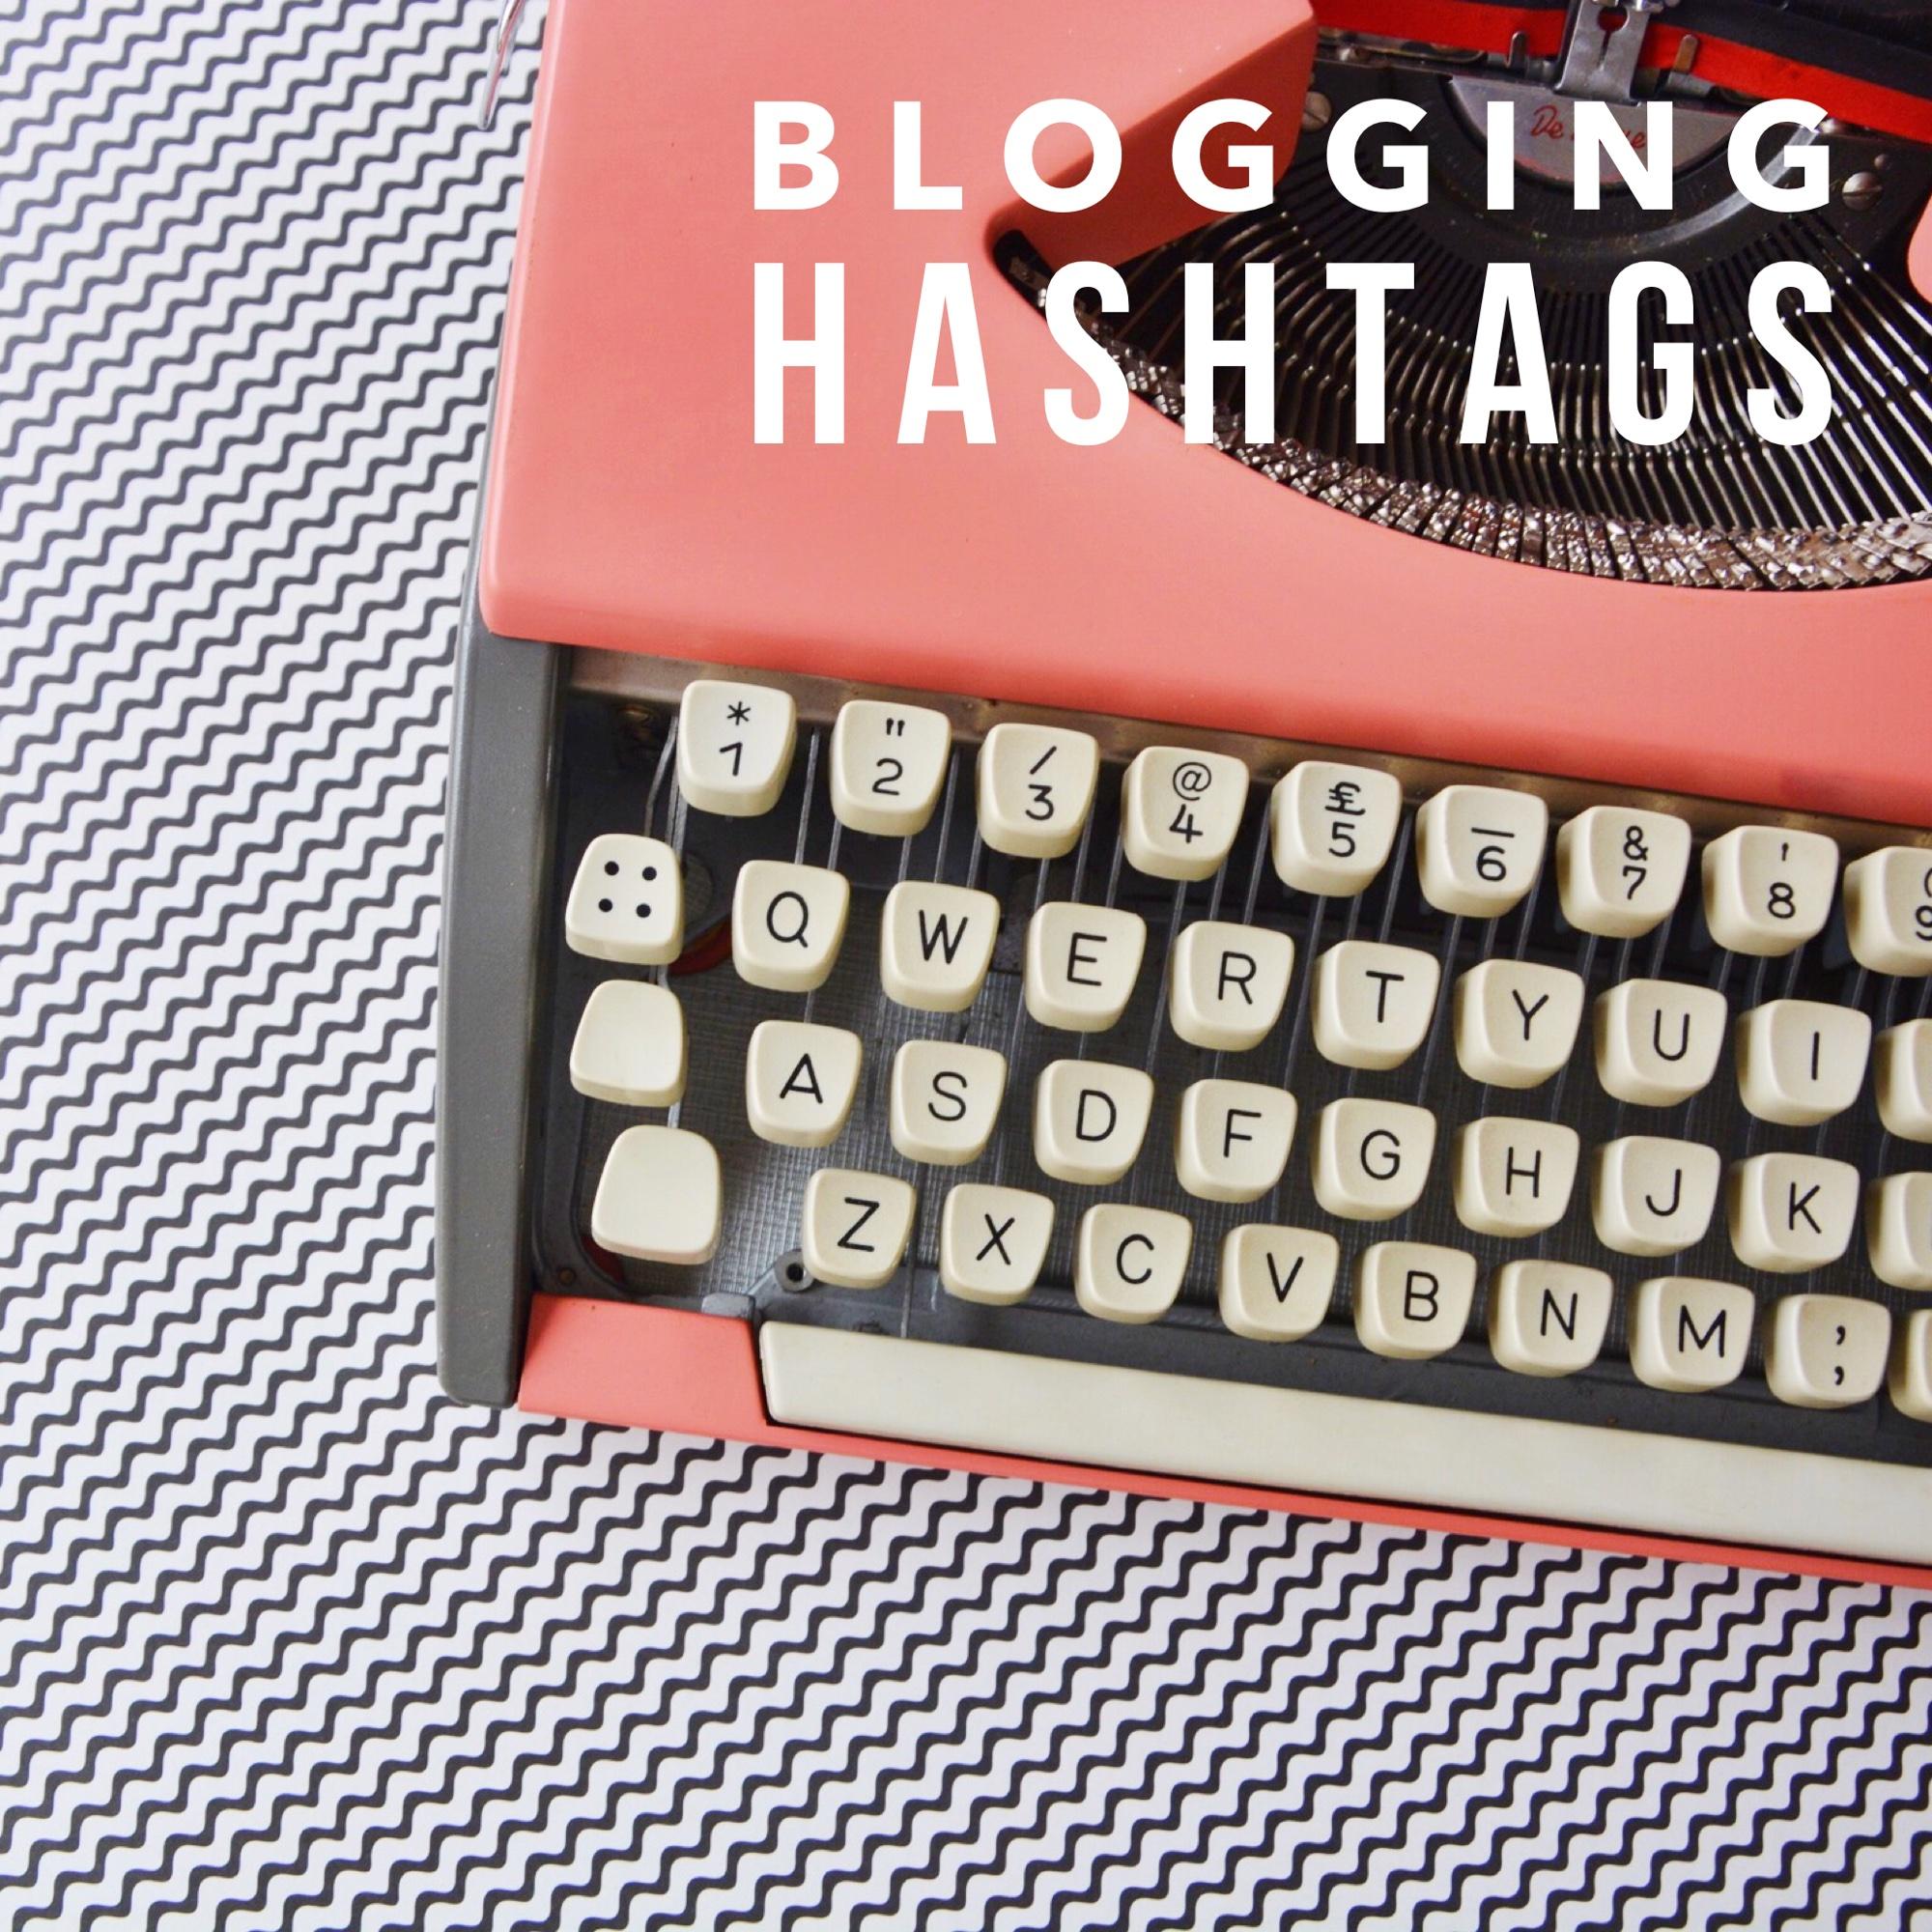 Blogging hashtags | Hello! Hooray!